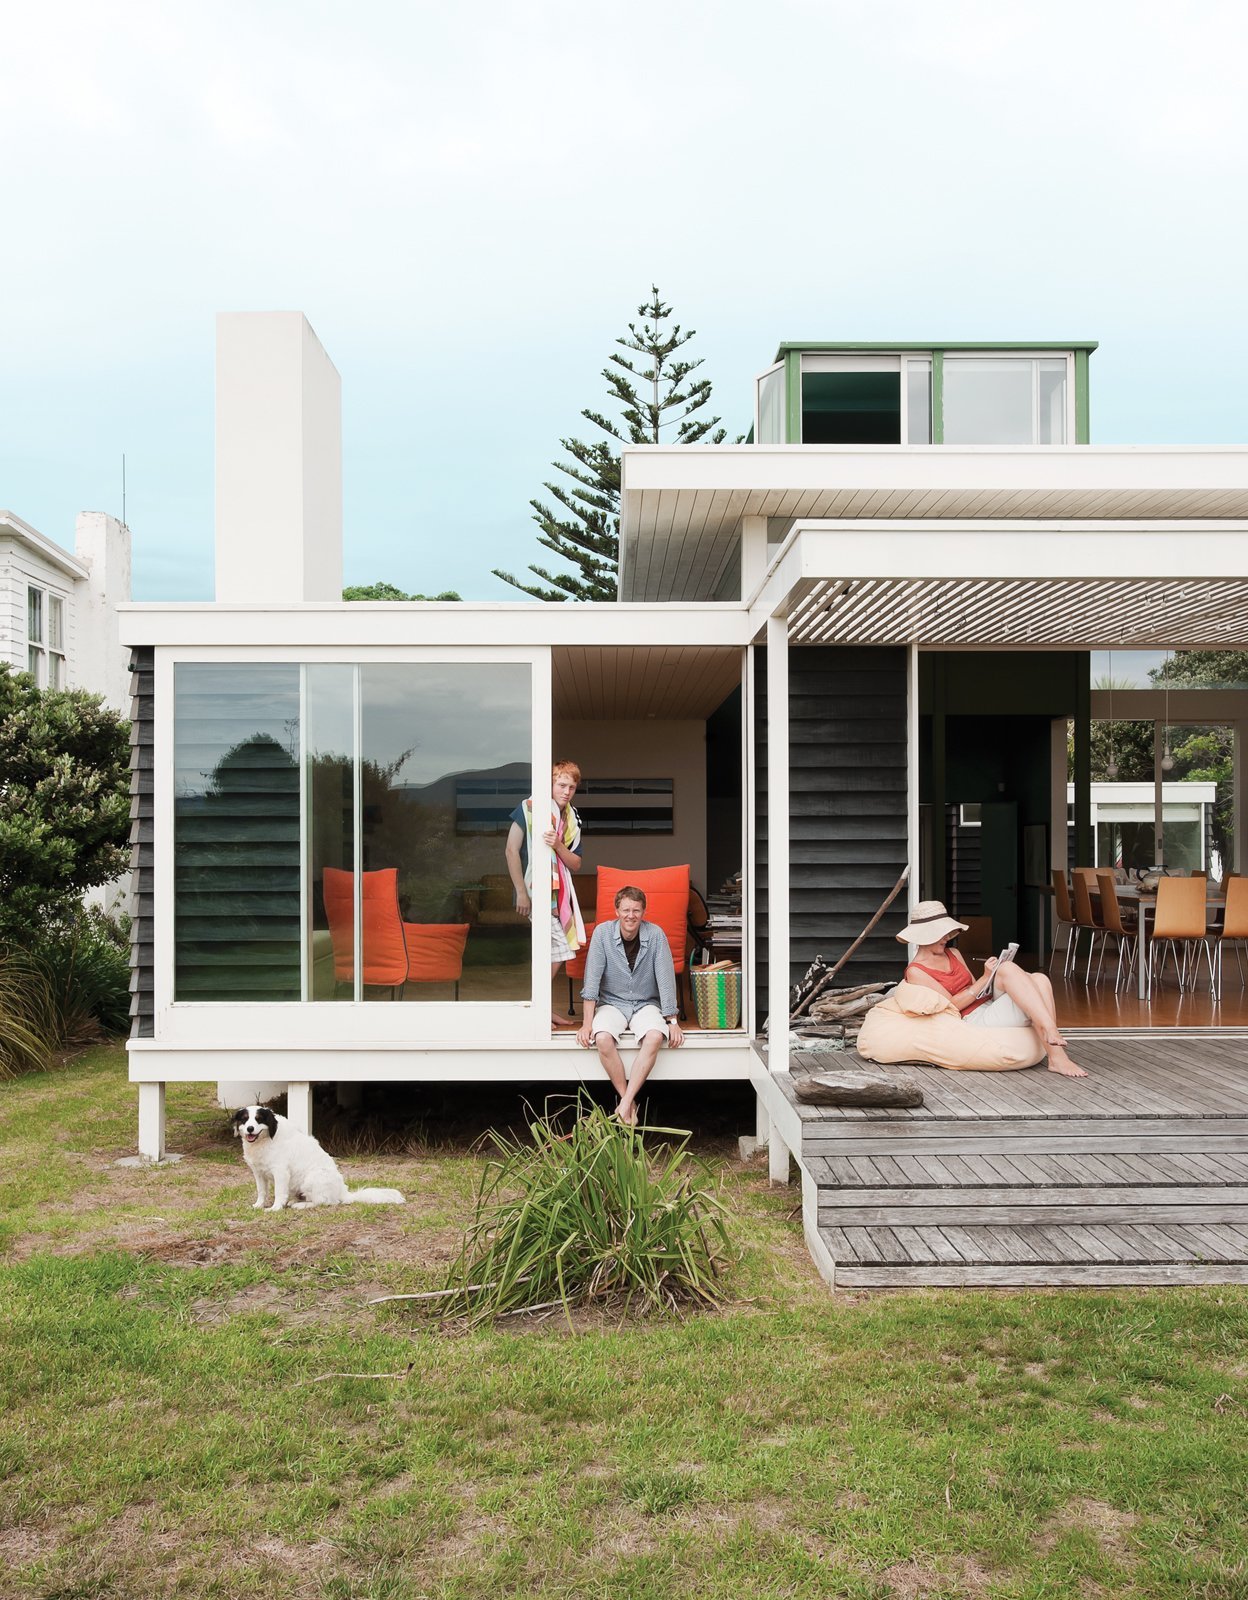 #paraparaumu #newzealand #modern #beach #beachhouse #baches #vacationhome #family #interior #exterior #indooroutdoorliving #minimal #humble  My Photos